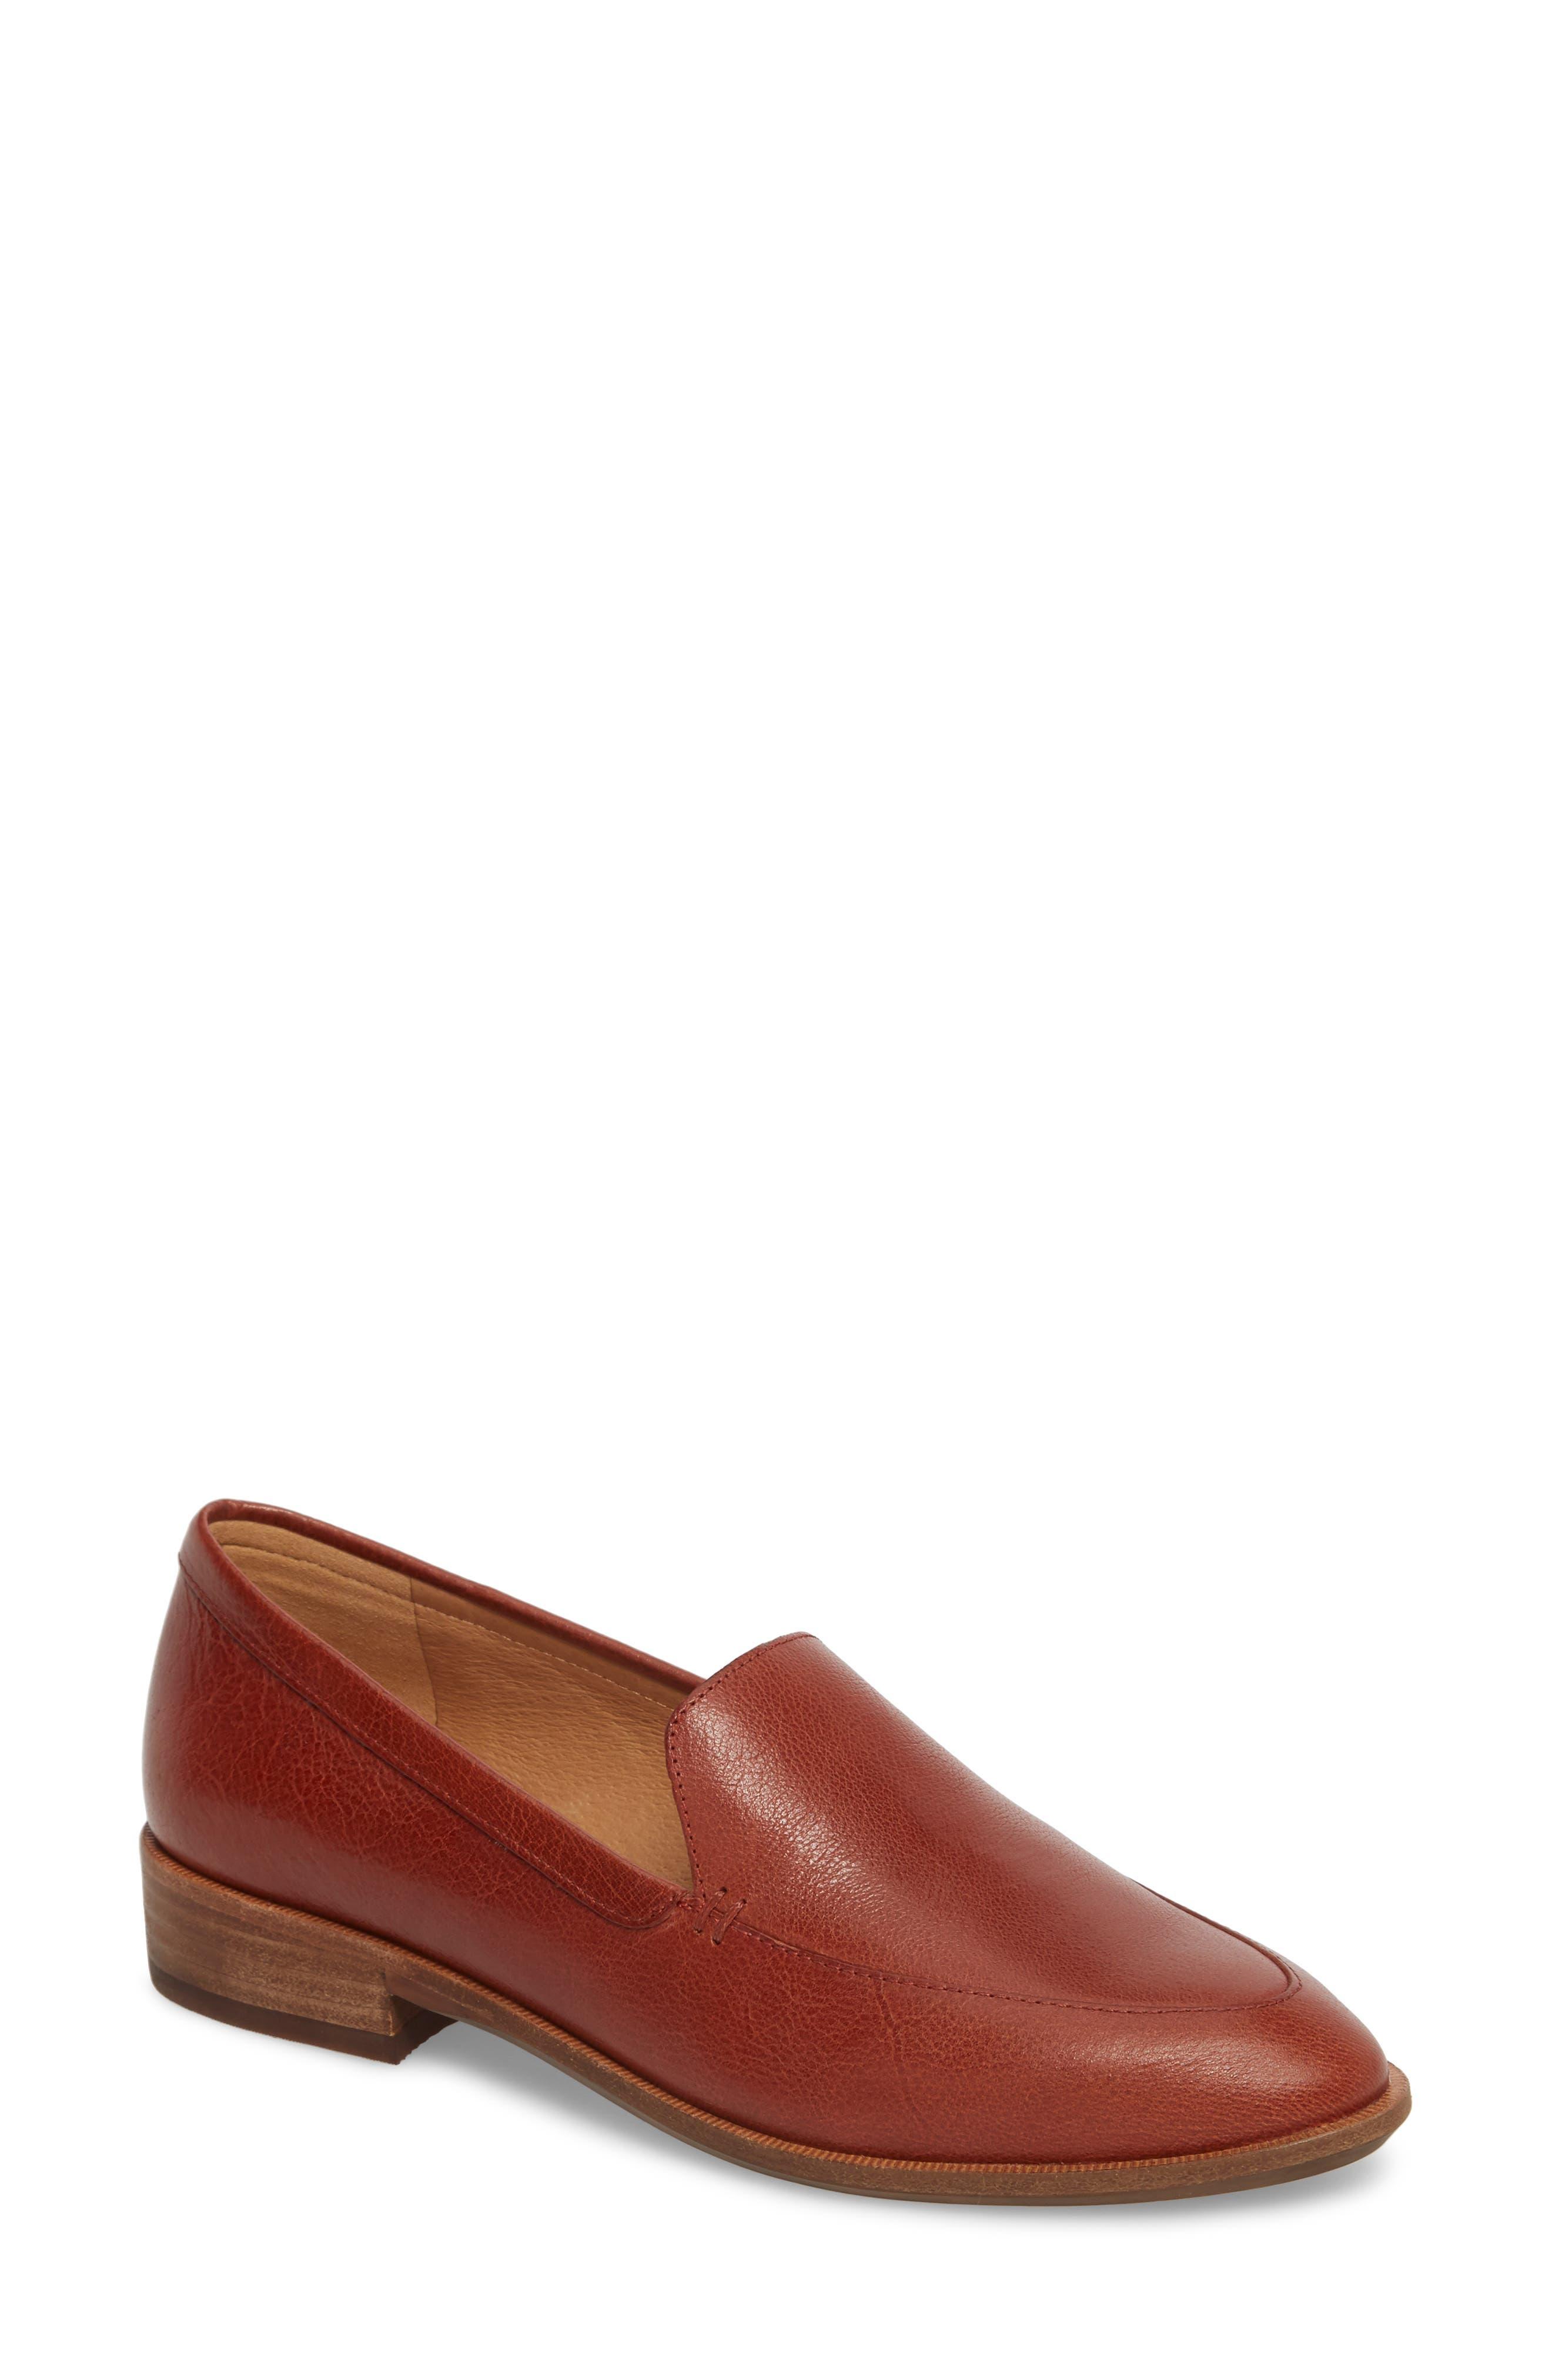 Frances Loafer,                         Main,                         color, Burnished Mahogany Leather